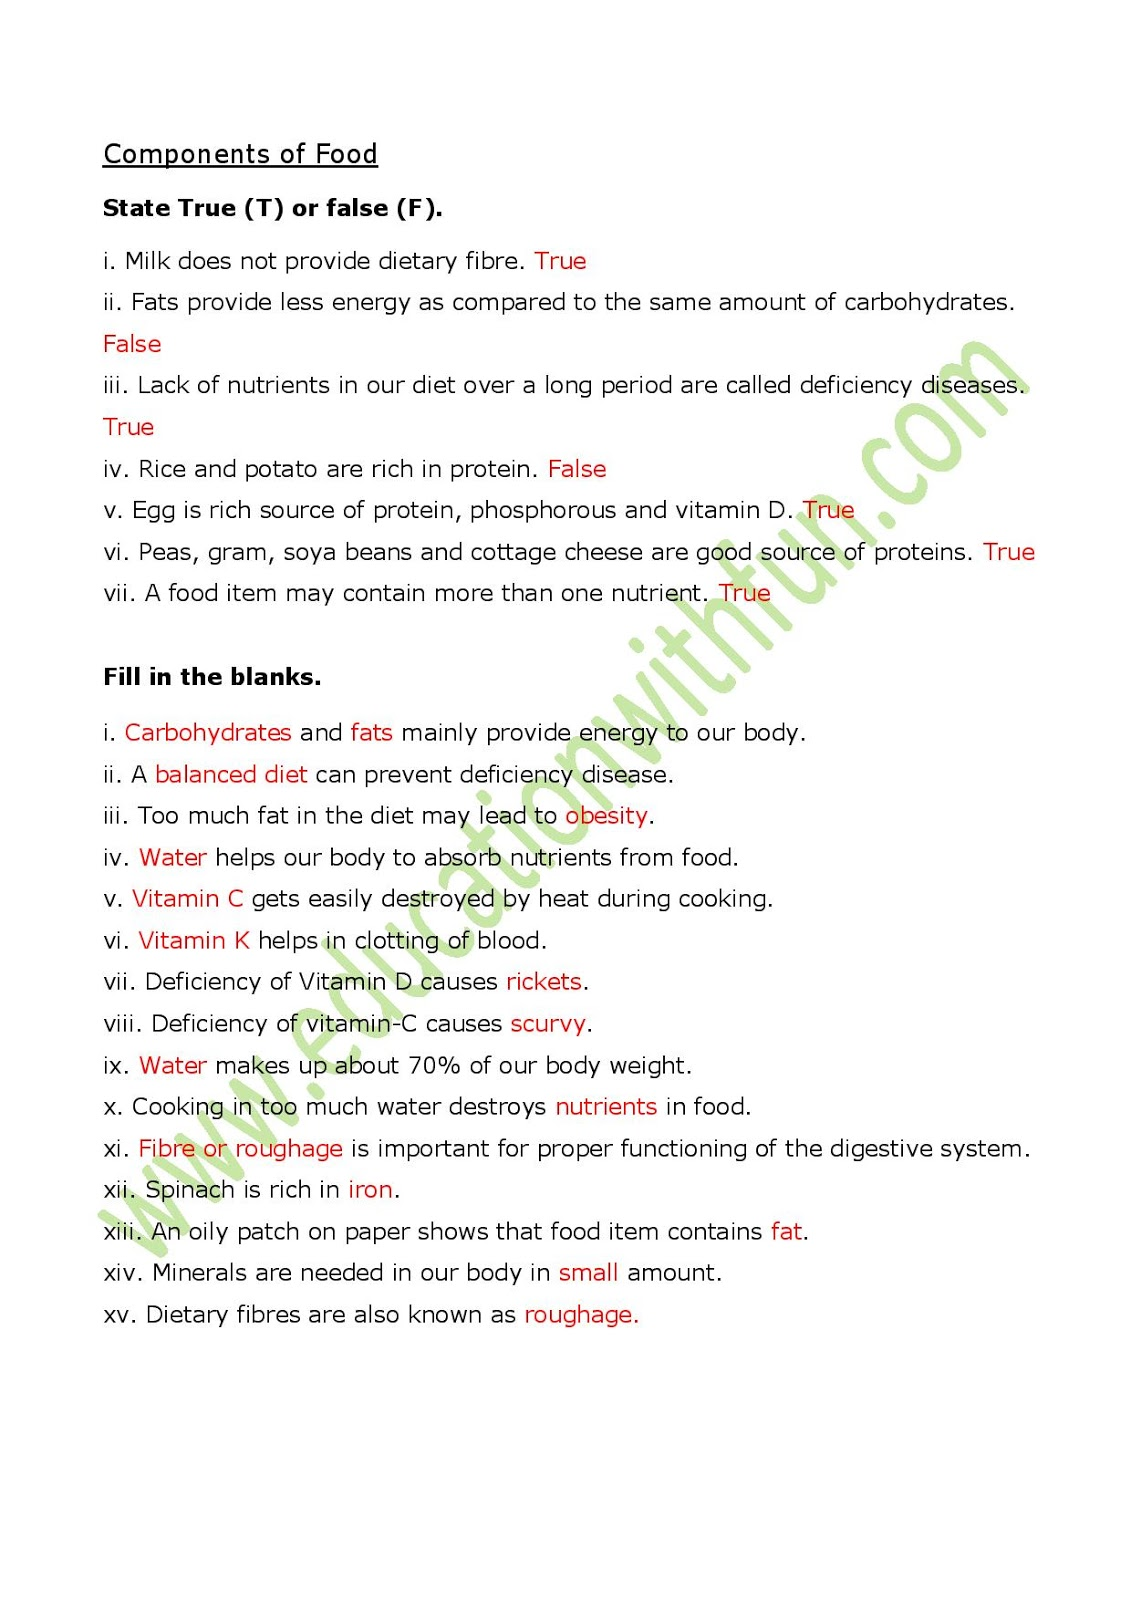 Class 6 Ch 2 Worksheet 1 Solutions